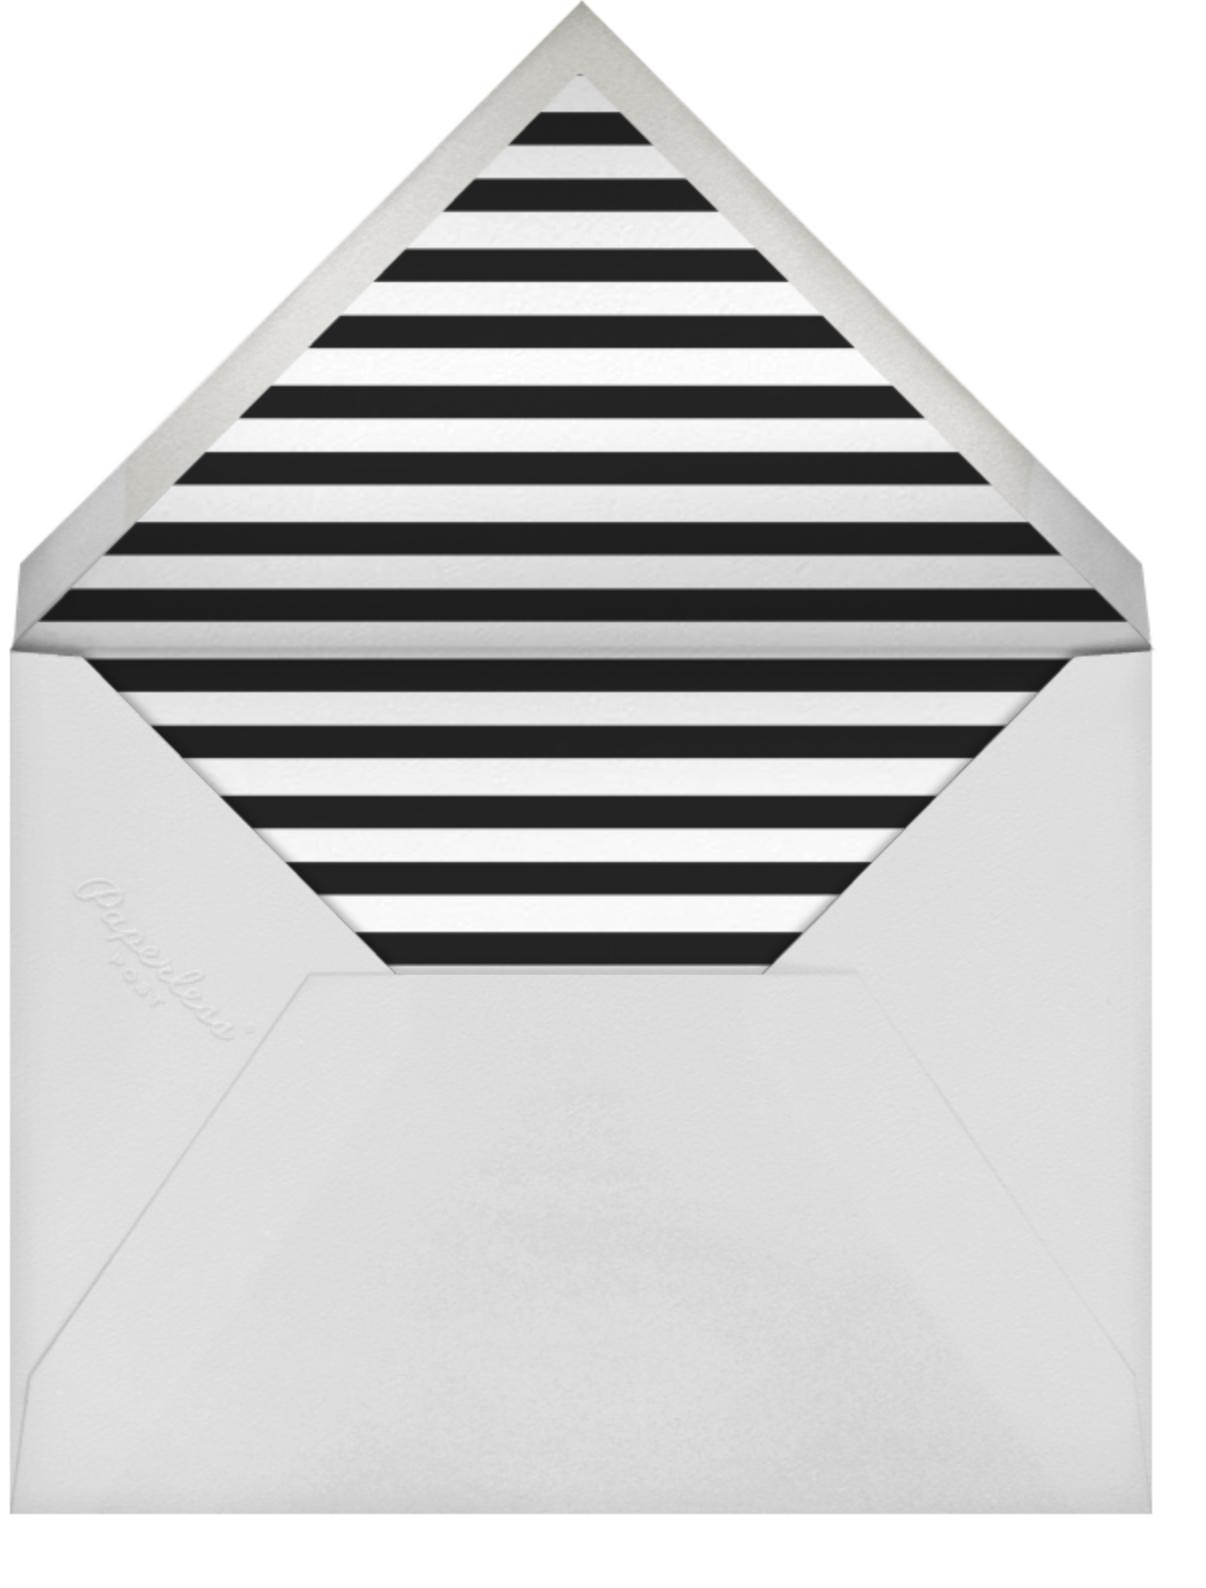 Faial (Invitation) - kate spade new york - All - envelope back